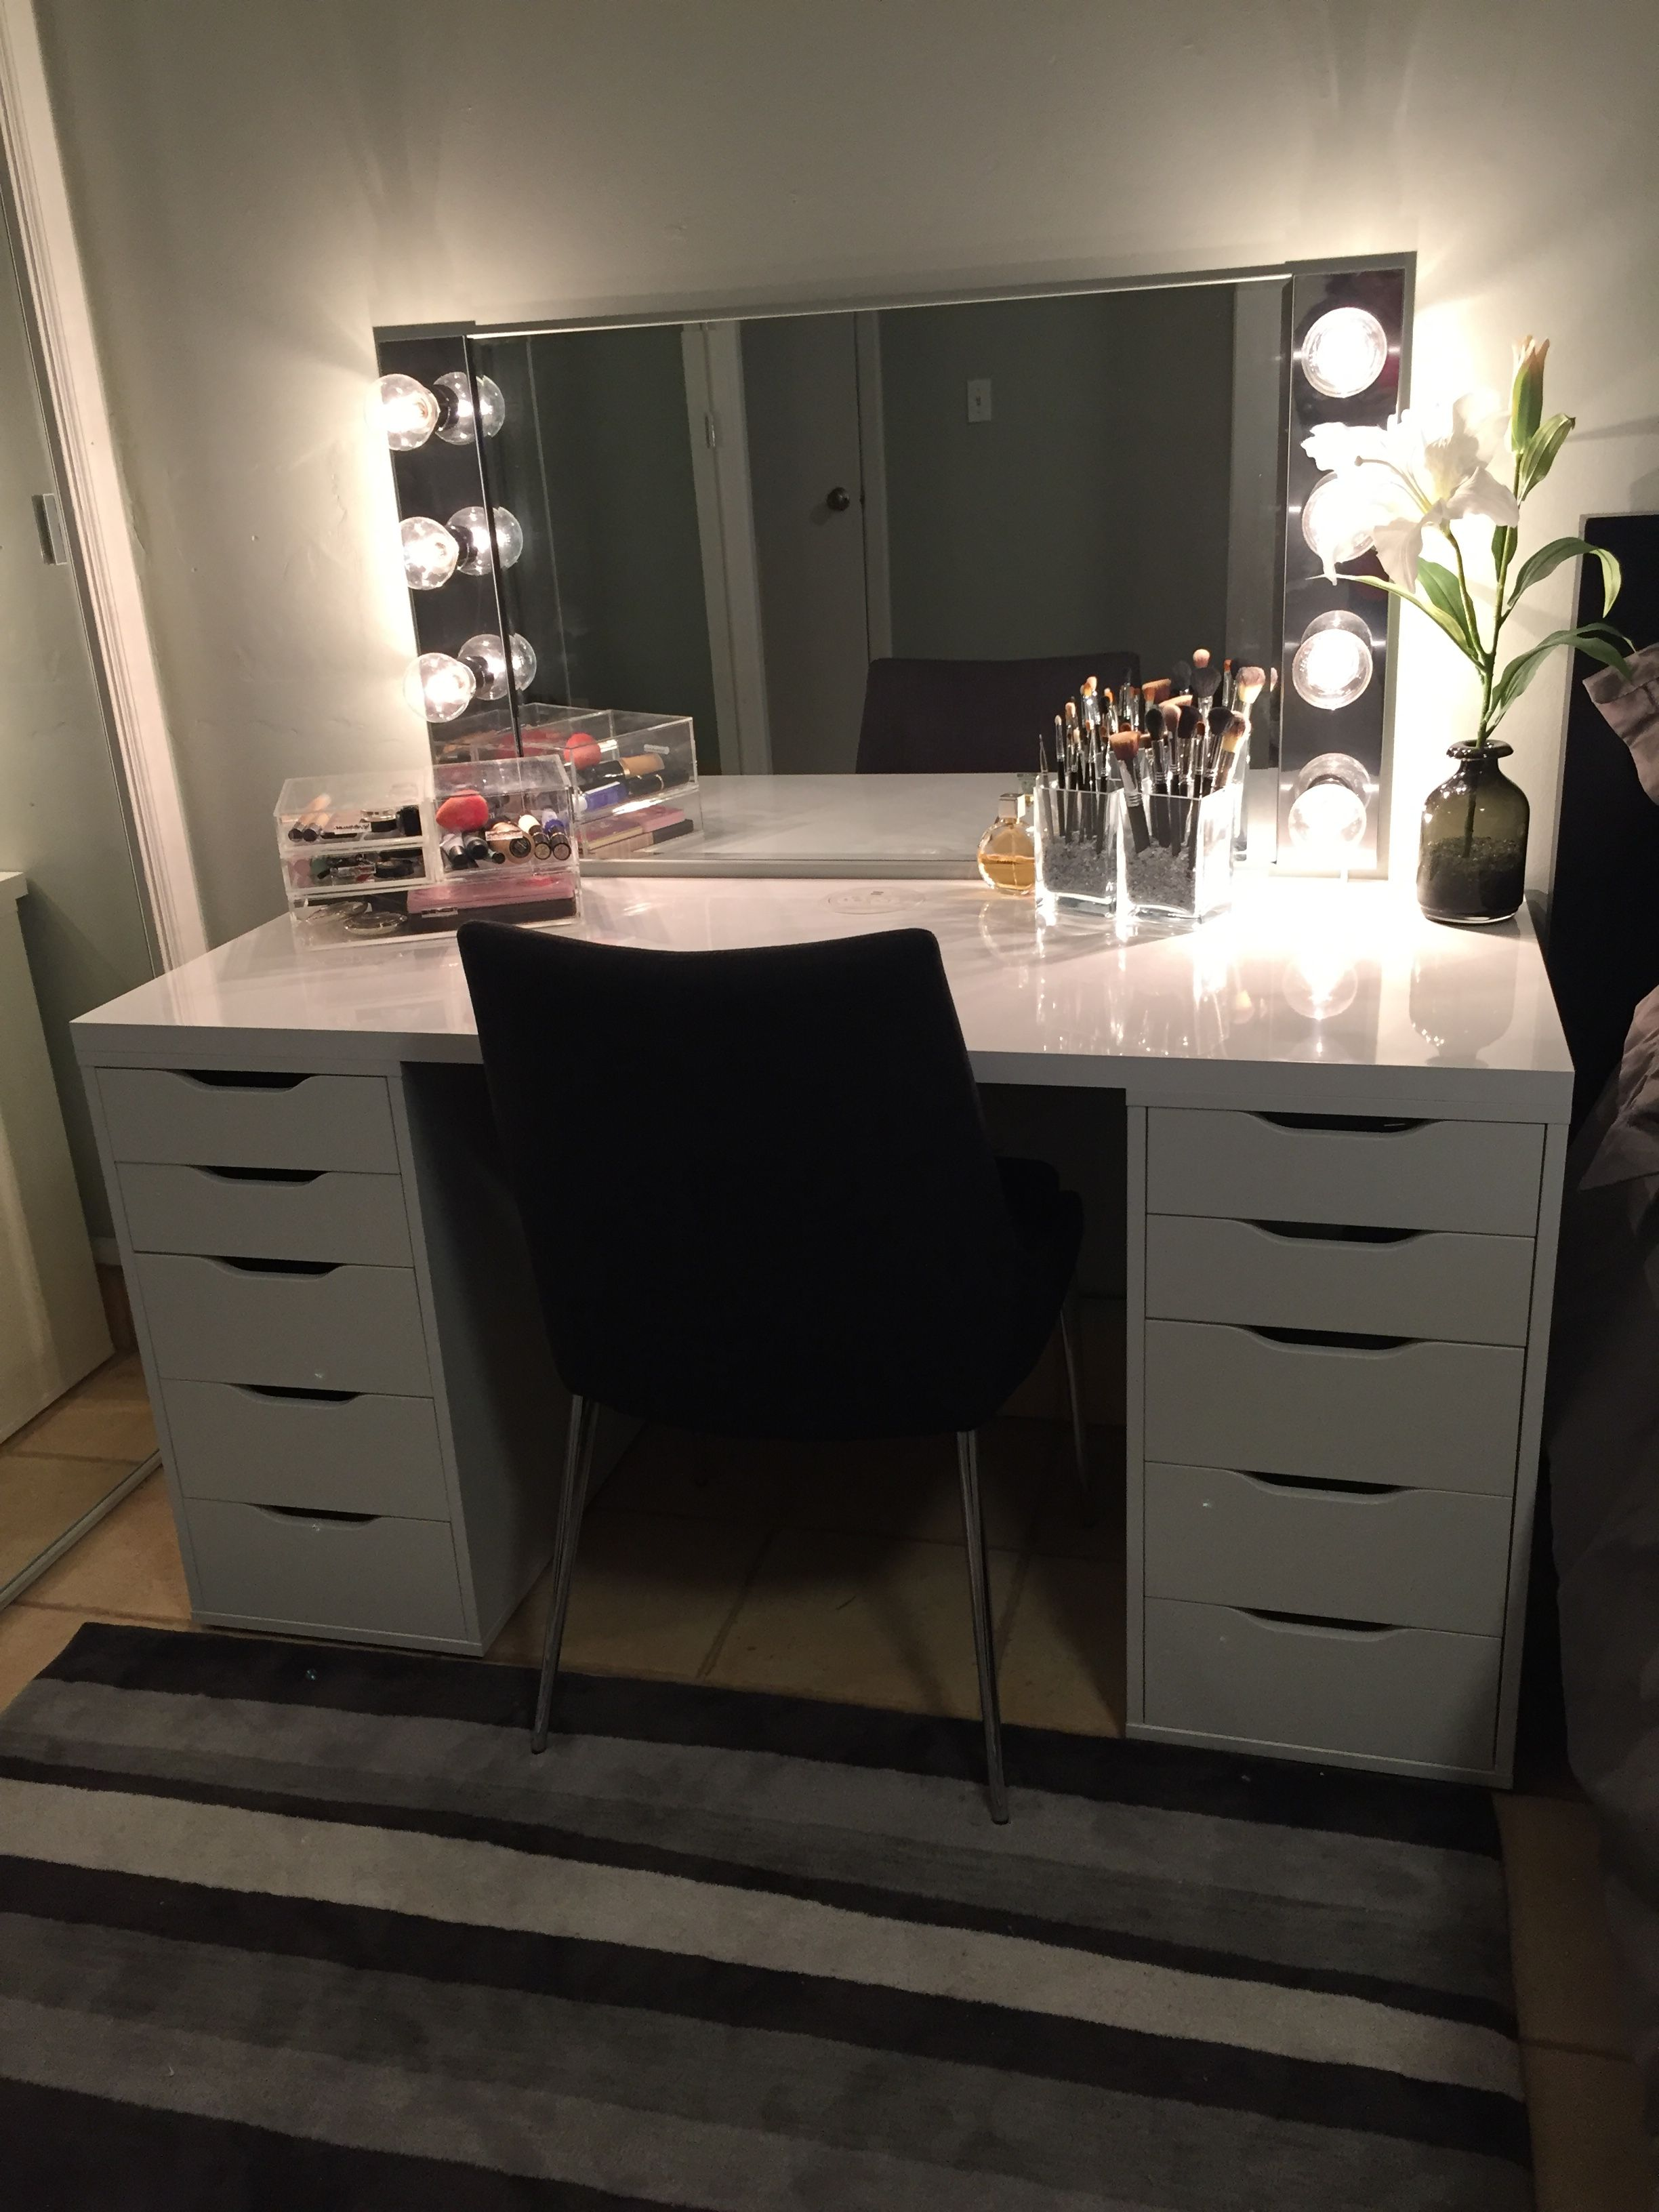 Diy Makeup Vanity. Ikea Alex Drawers With Glossy